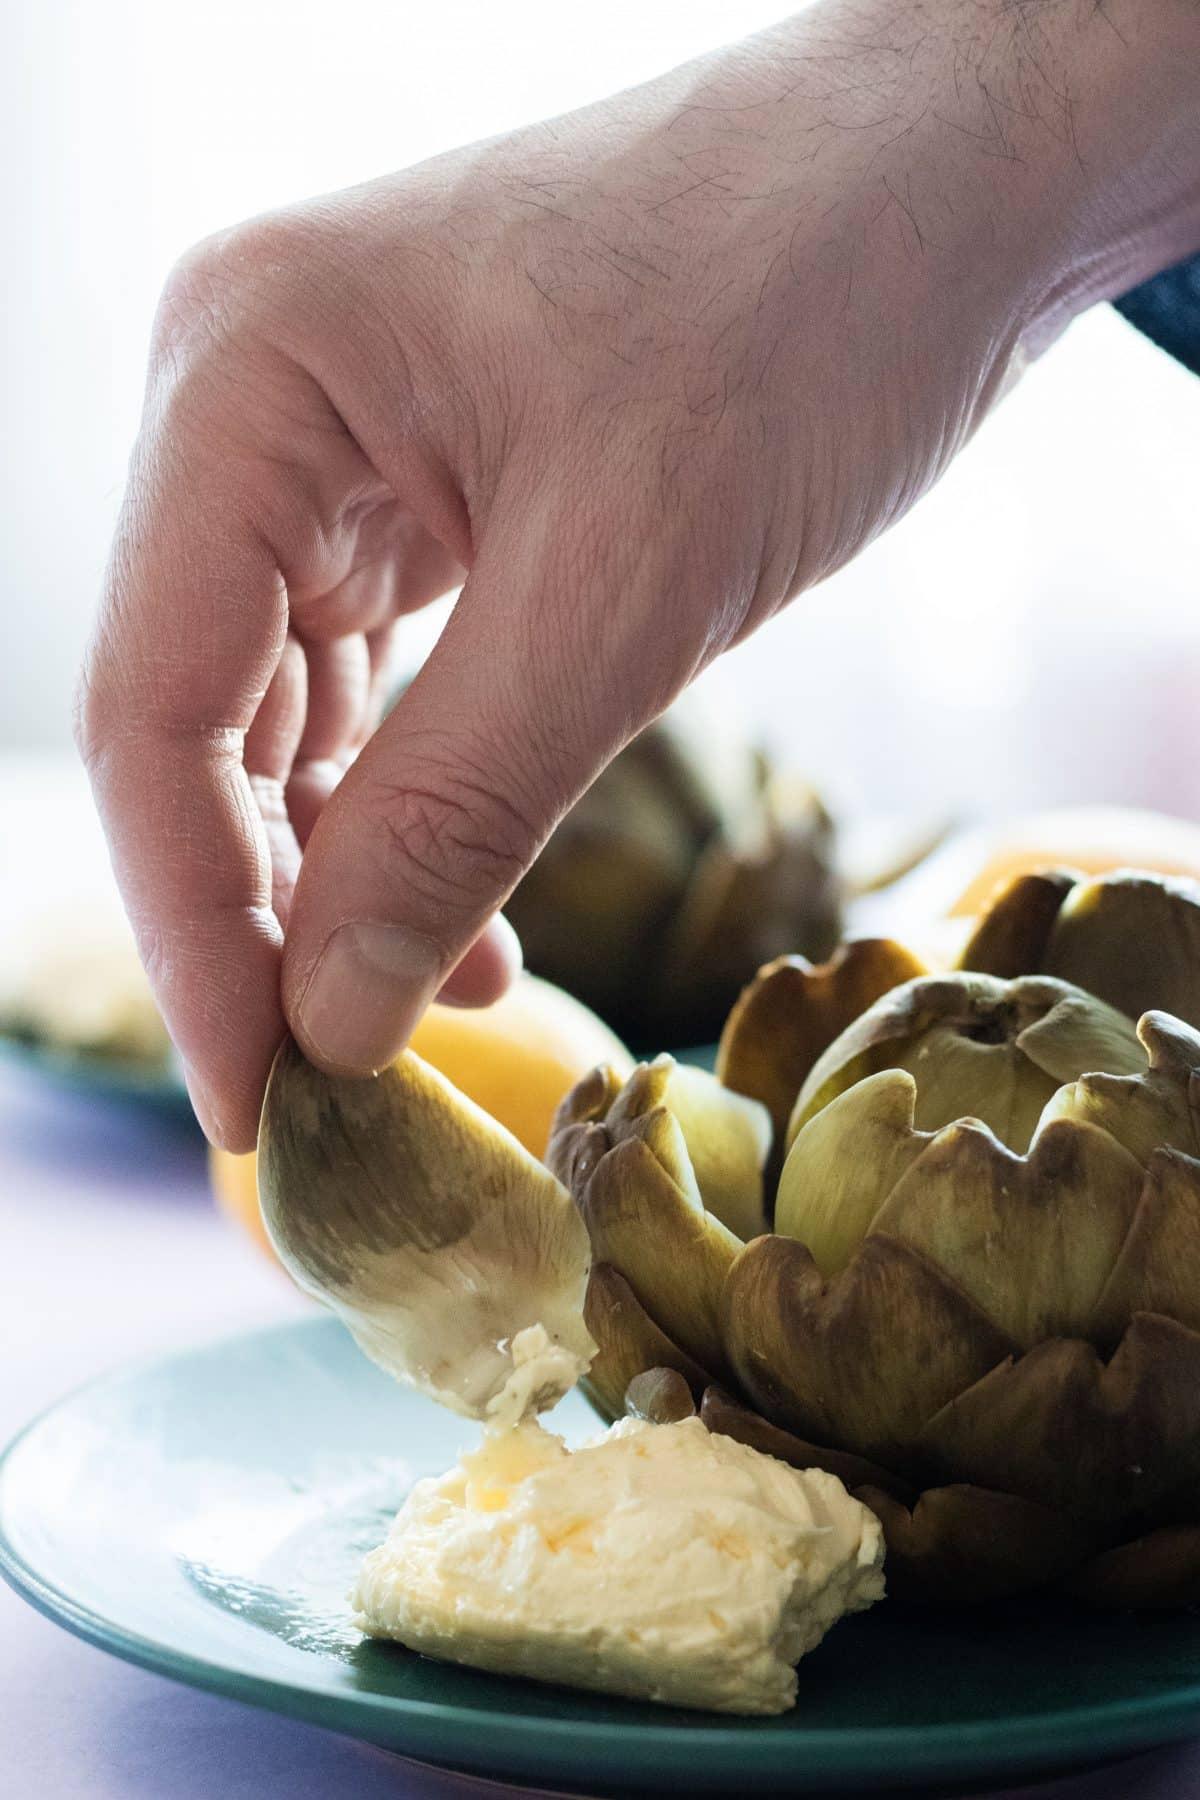 dipping an artichoke leaf in whipped lemon butter